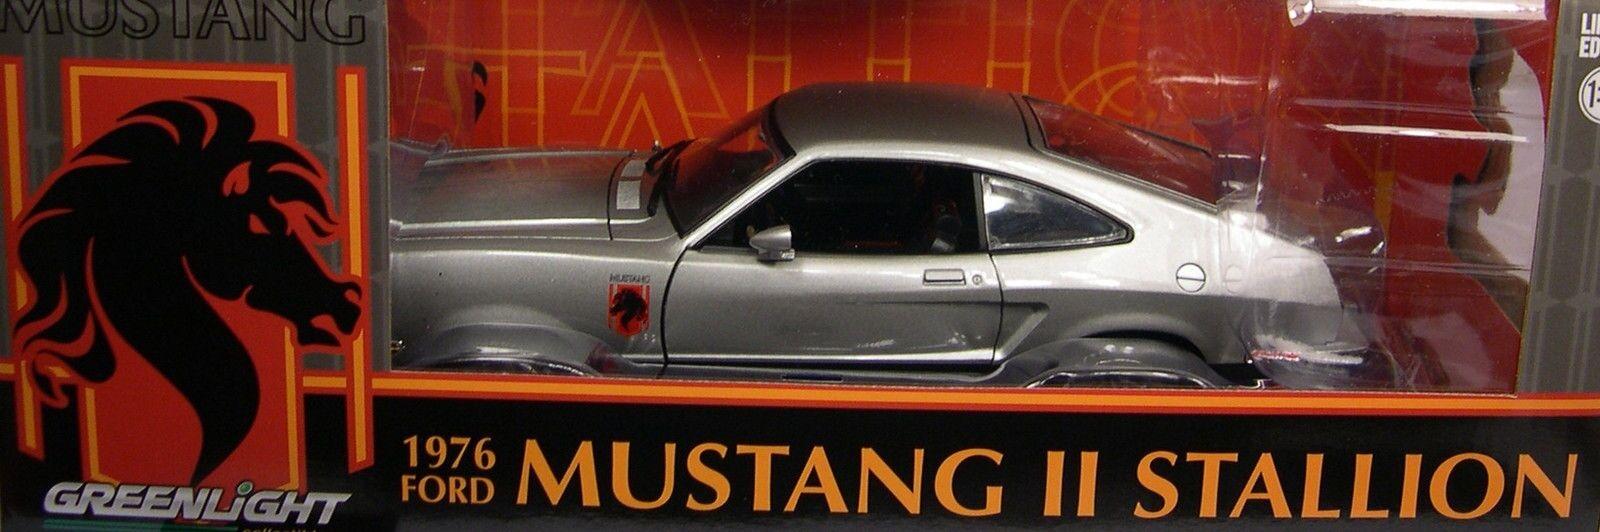 Plata 1976 Ford Mustang II Semental verdelight escala 1 18 Diecast metal coche